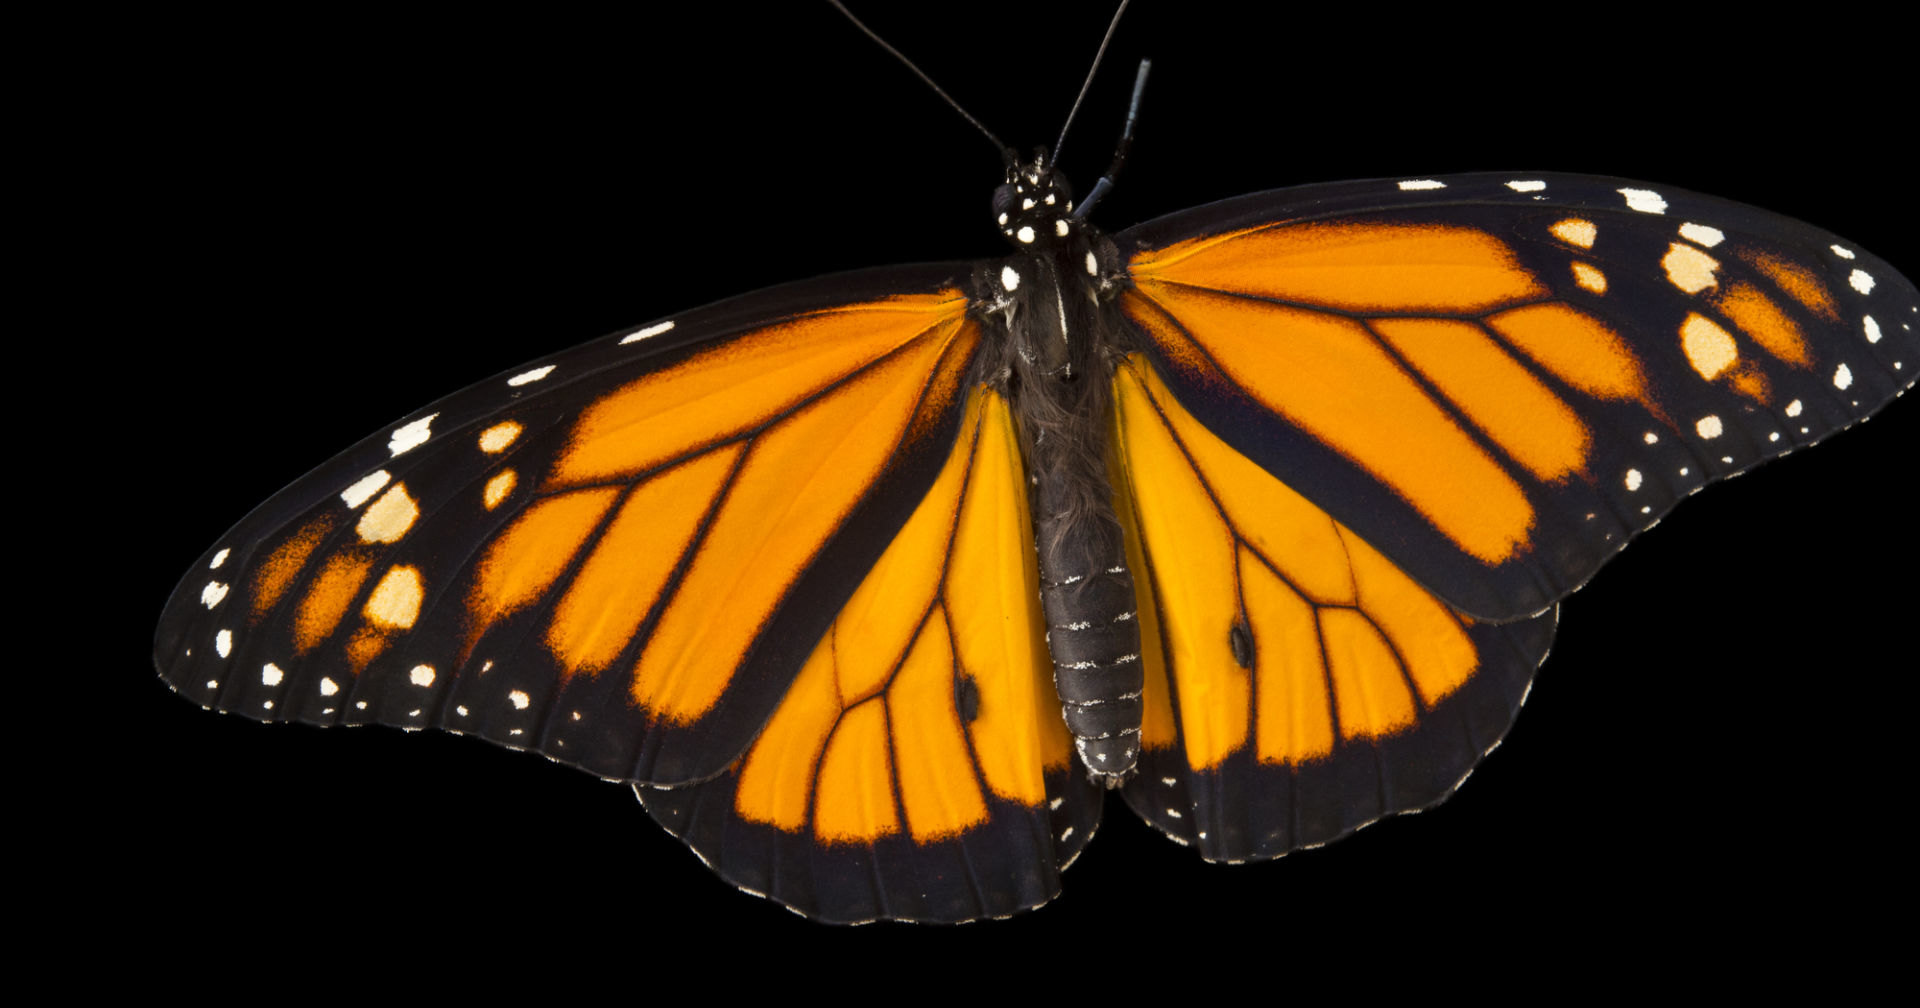 Бабочка-рекордсмен: 1000 км по ветру